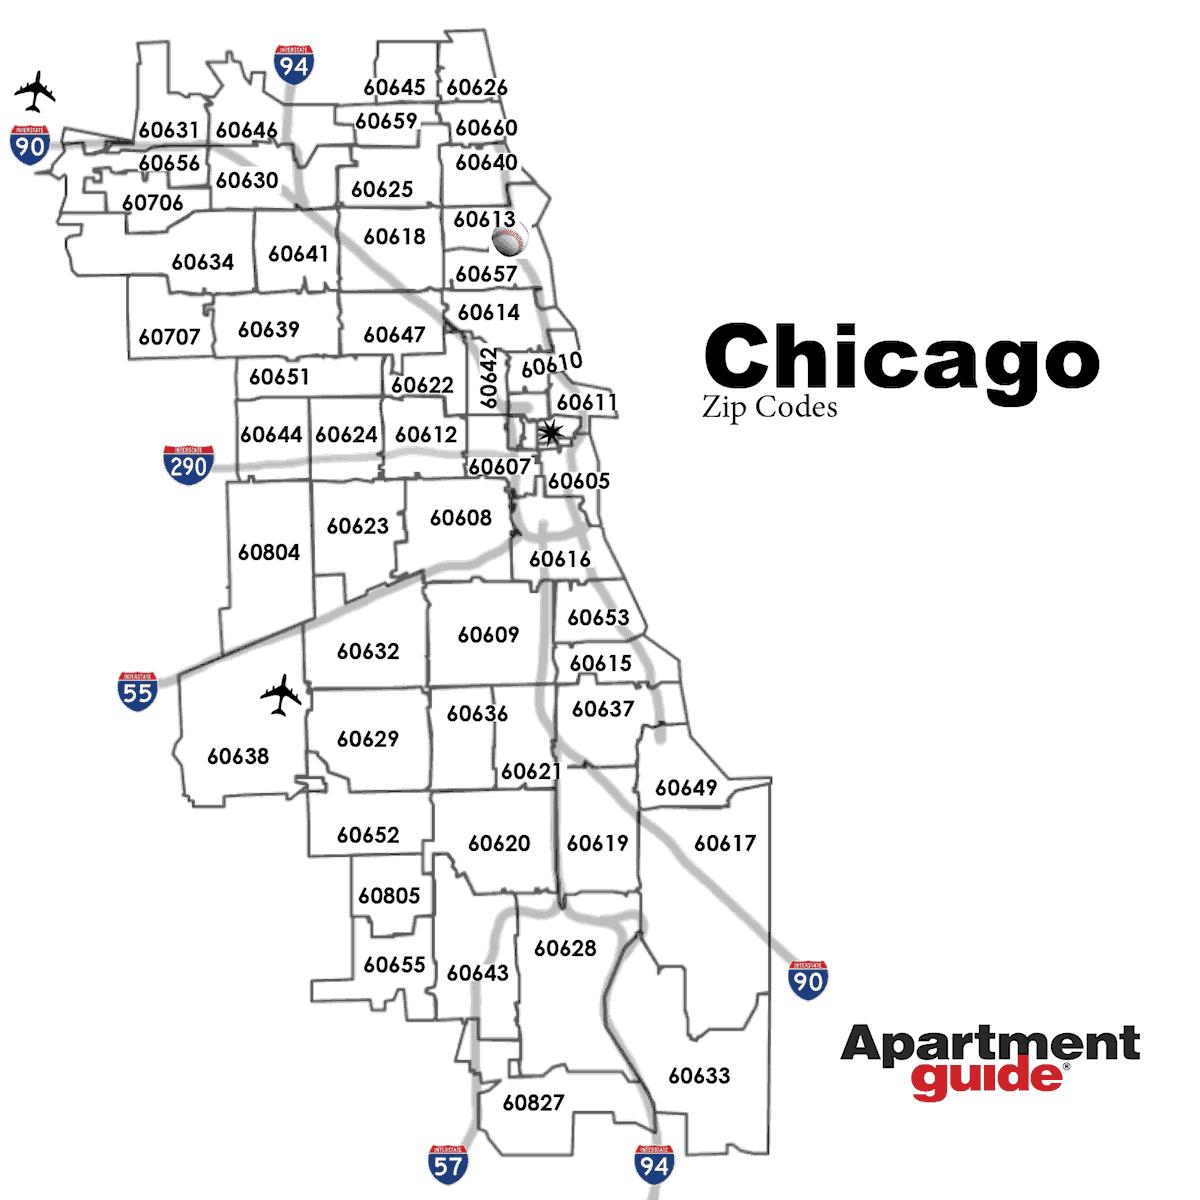 chicago zip codes